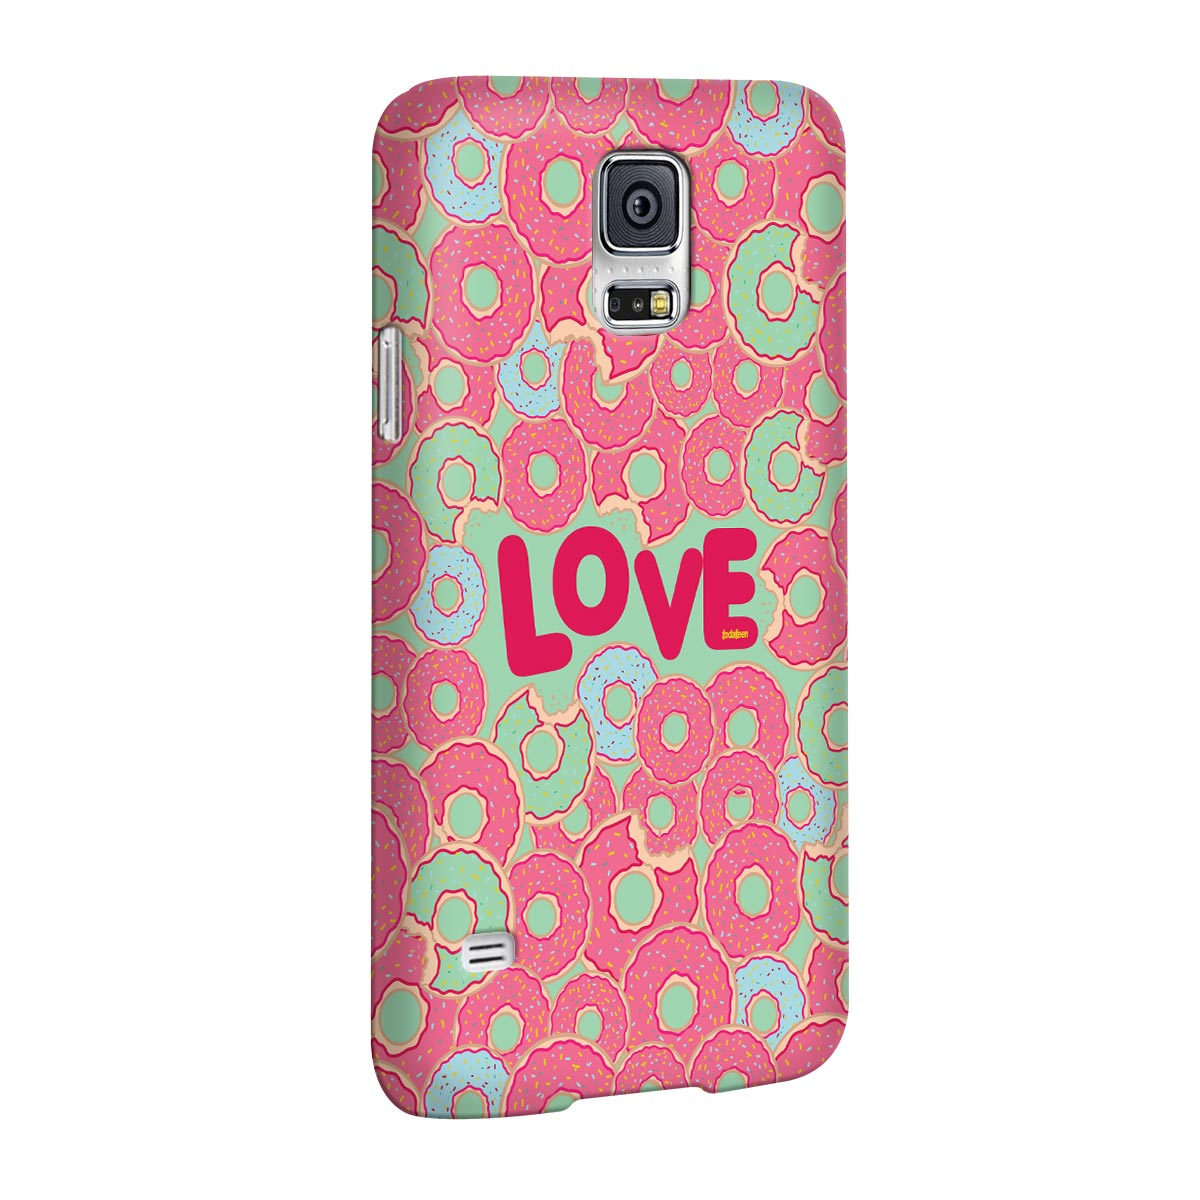 Capa para Galaxy S5 TodaTeen Love Donuts!